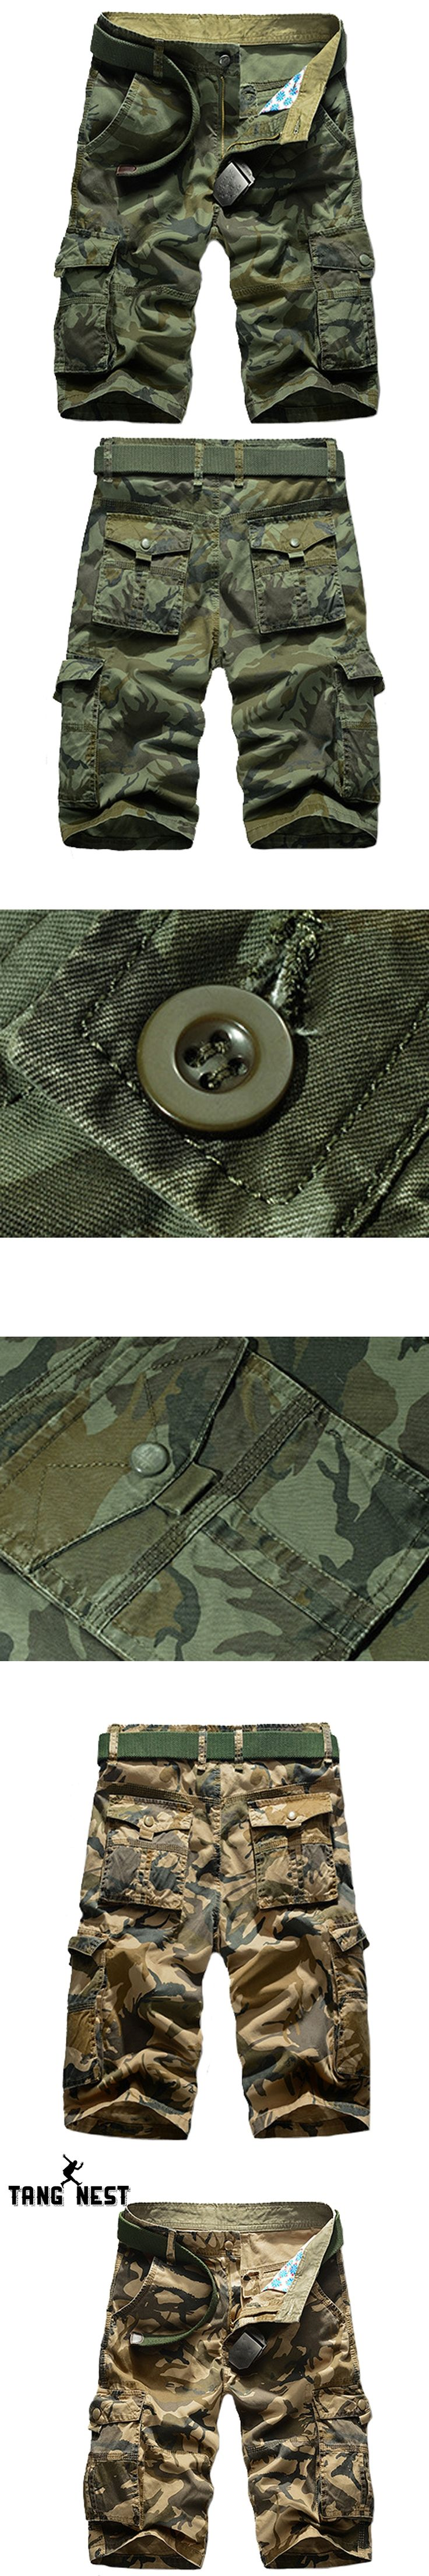 TANGNEST 2017 Men Casual Shorts Without Belt Multi-pocket Military Camouflage Men Shorts Hot Sale Good Quality Short MKD1051